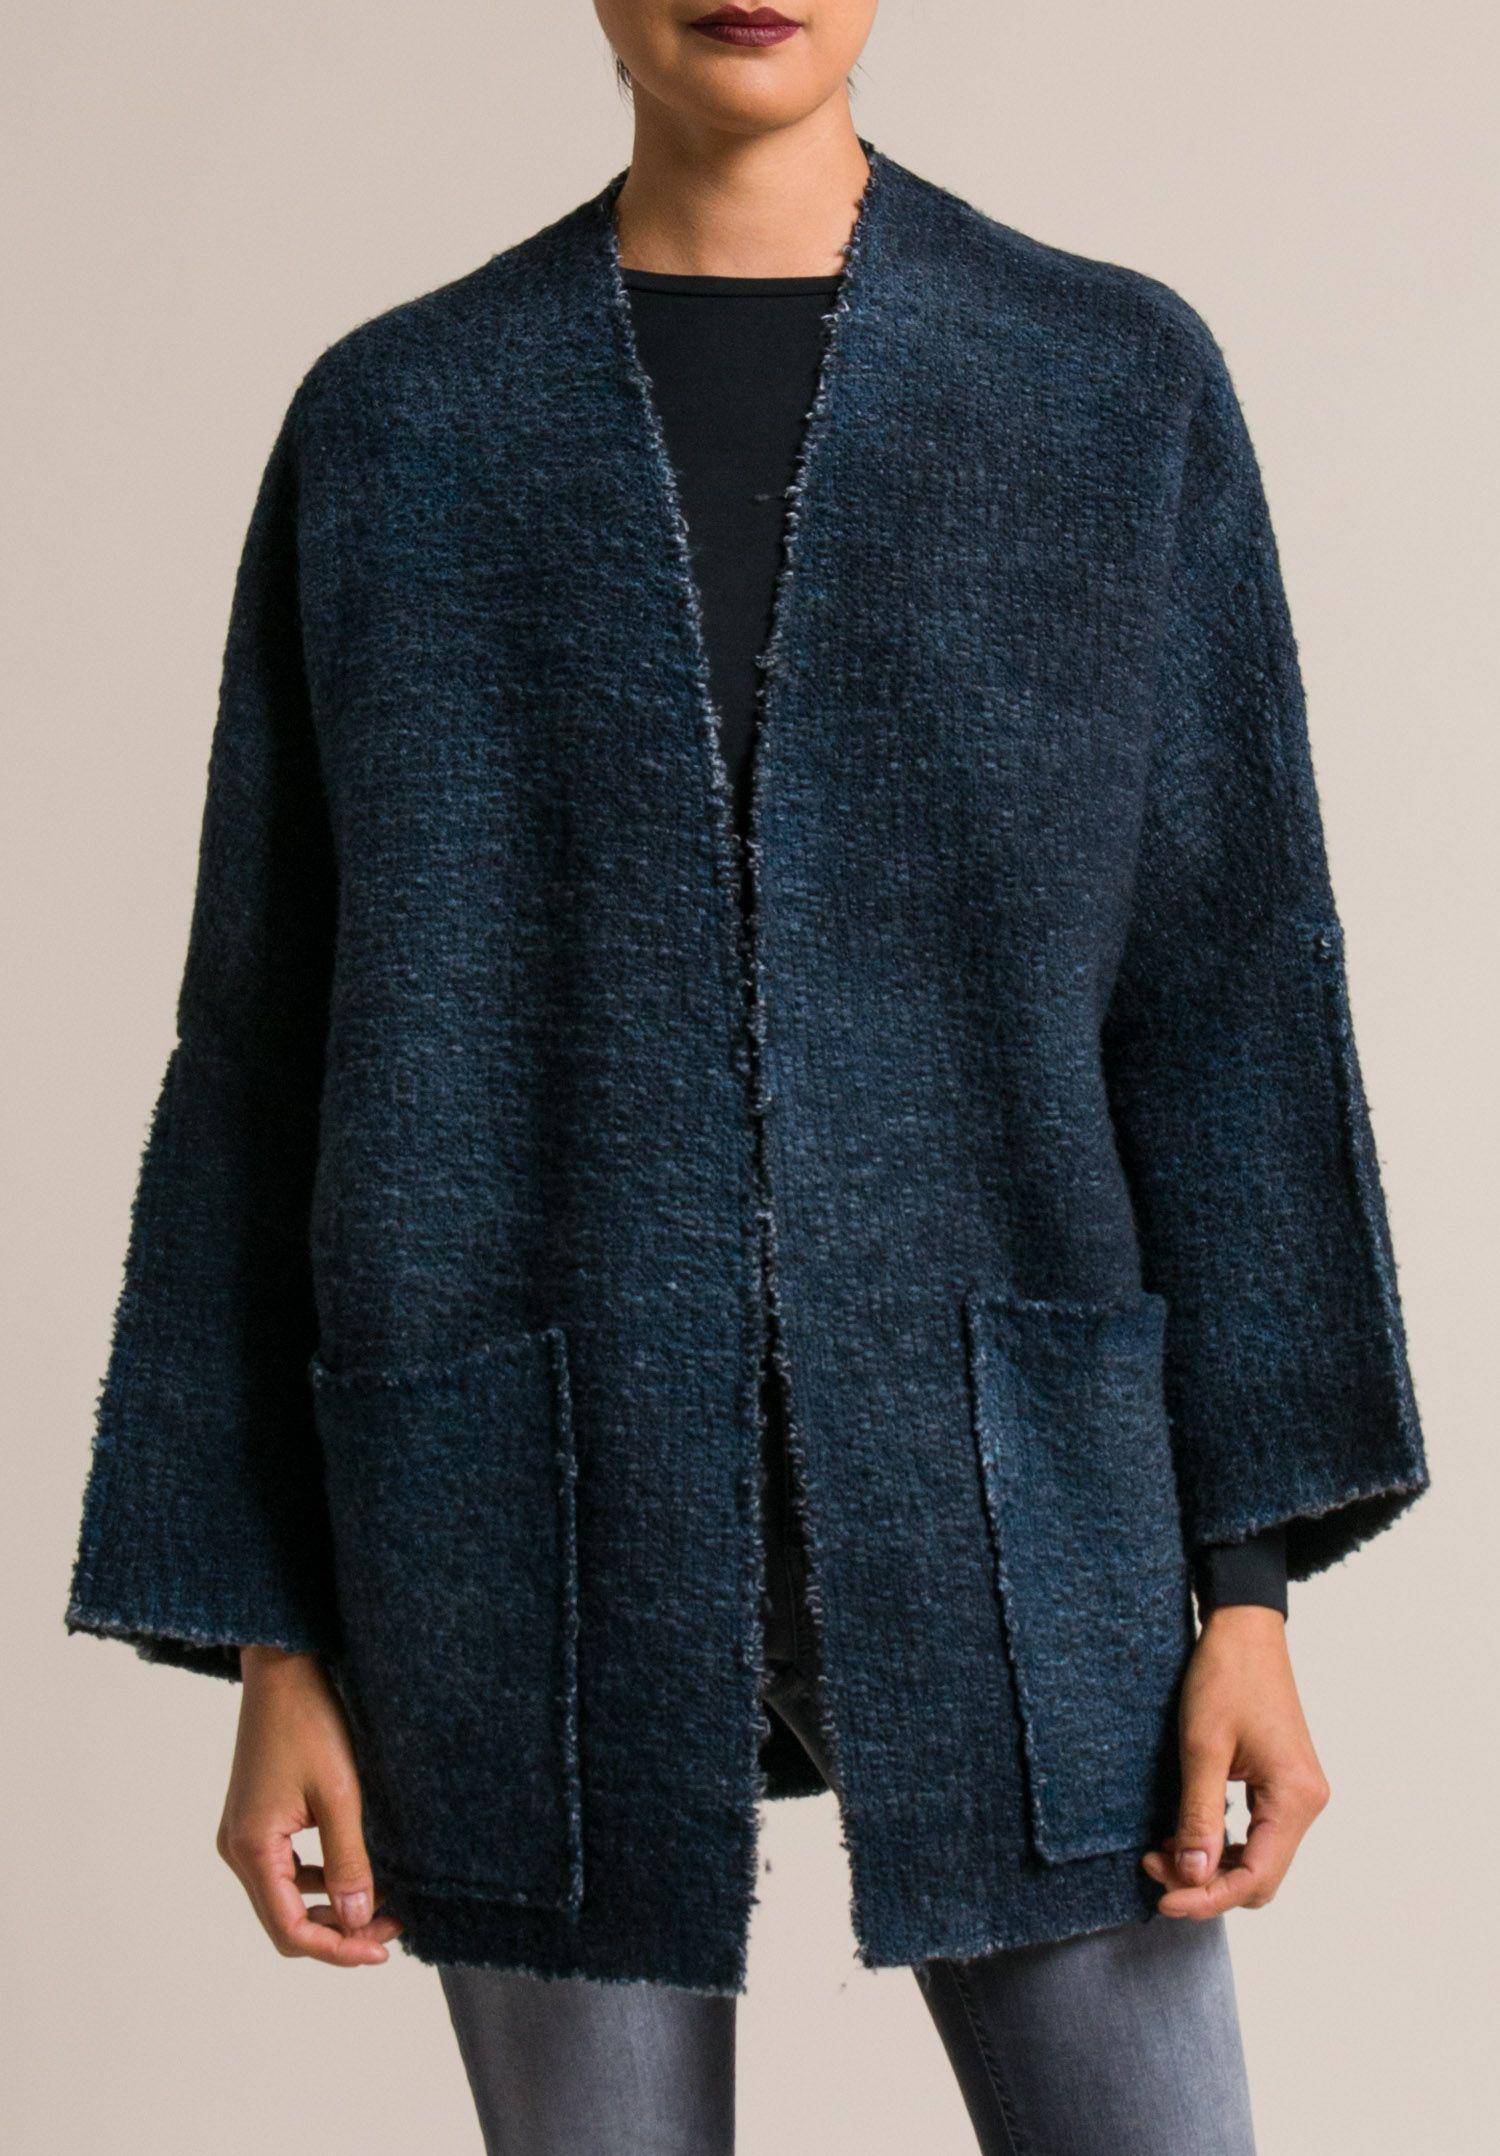 Avant Toi Kimono Cardigan in Blue Navy | clothing | Pinterest ...